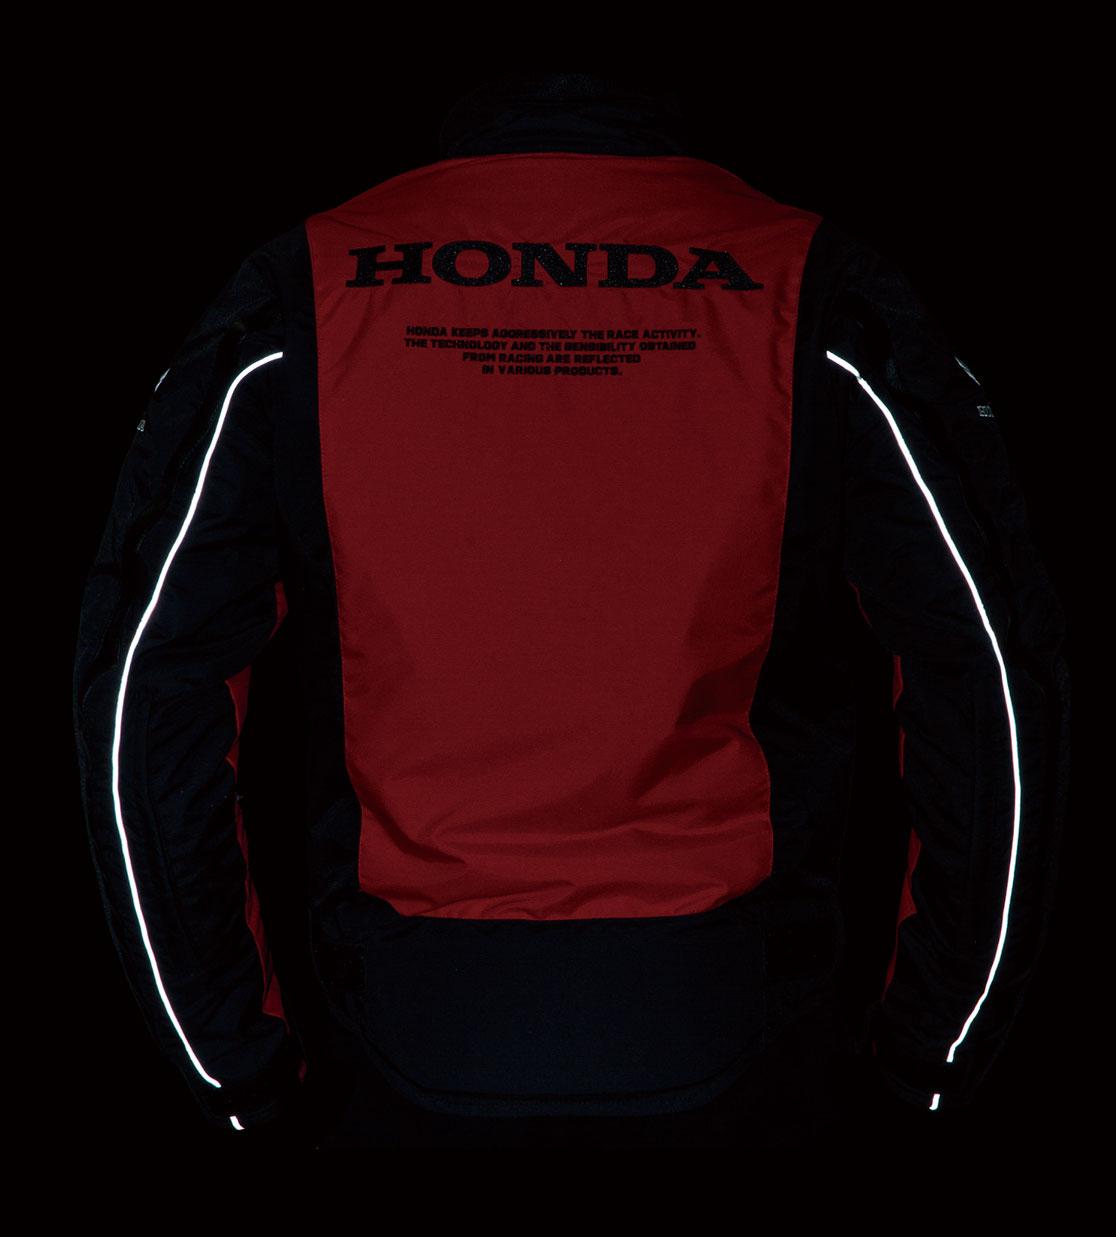 【HONDA RIDING GEAR】【HRC】AS騎士布勞森外套 - 「Webike-摩托百貨」